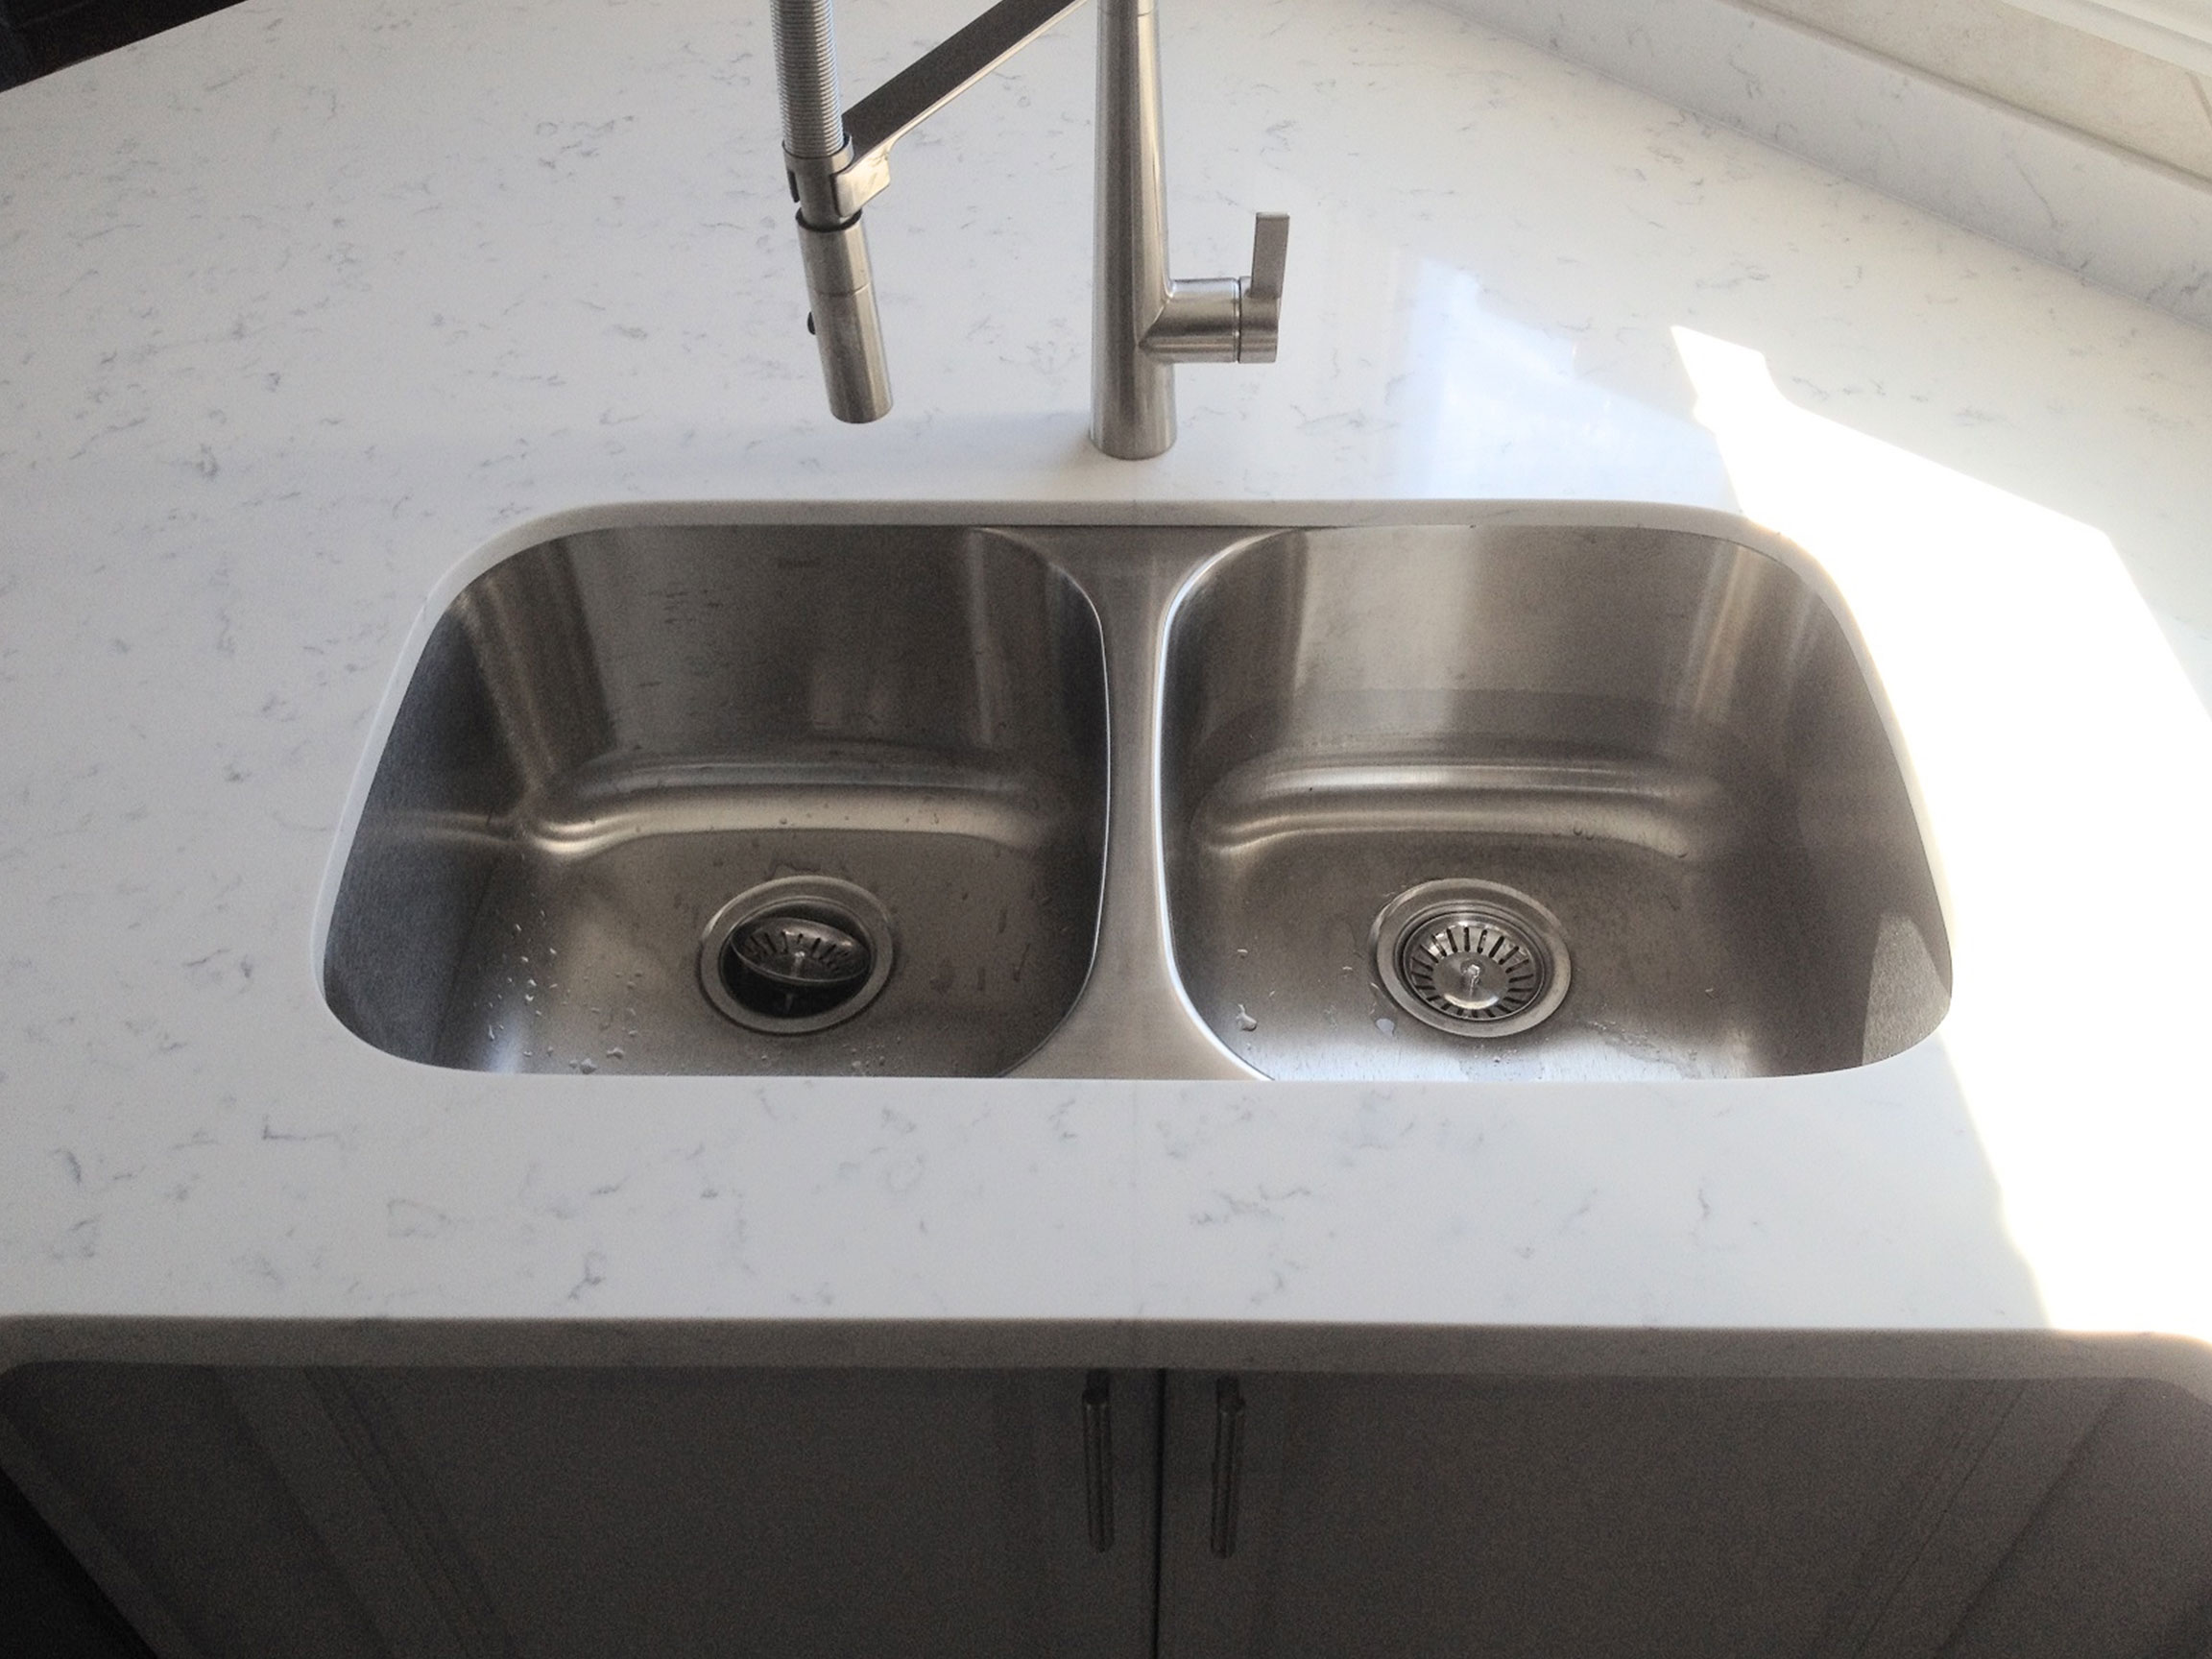 Under Mount Sink After